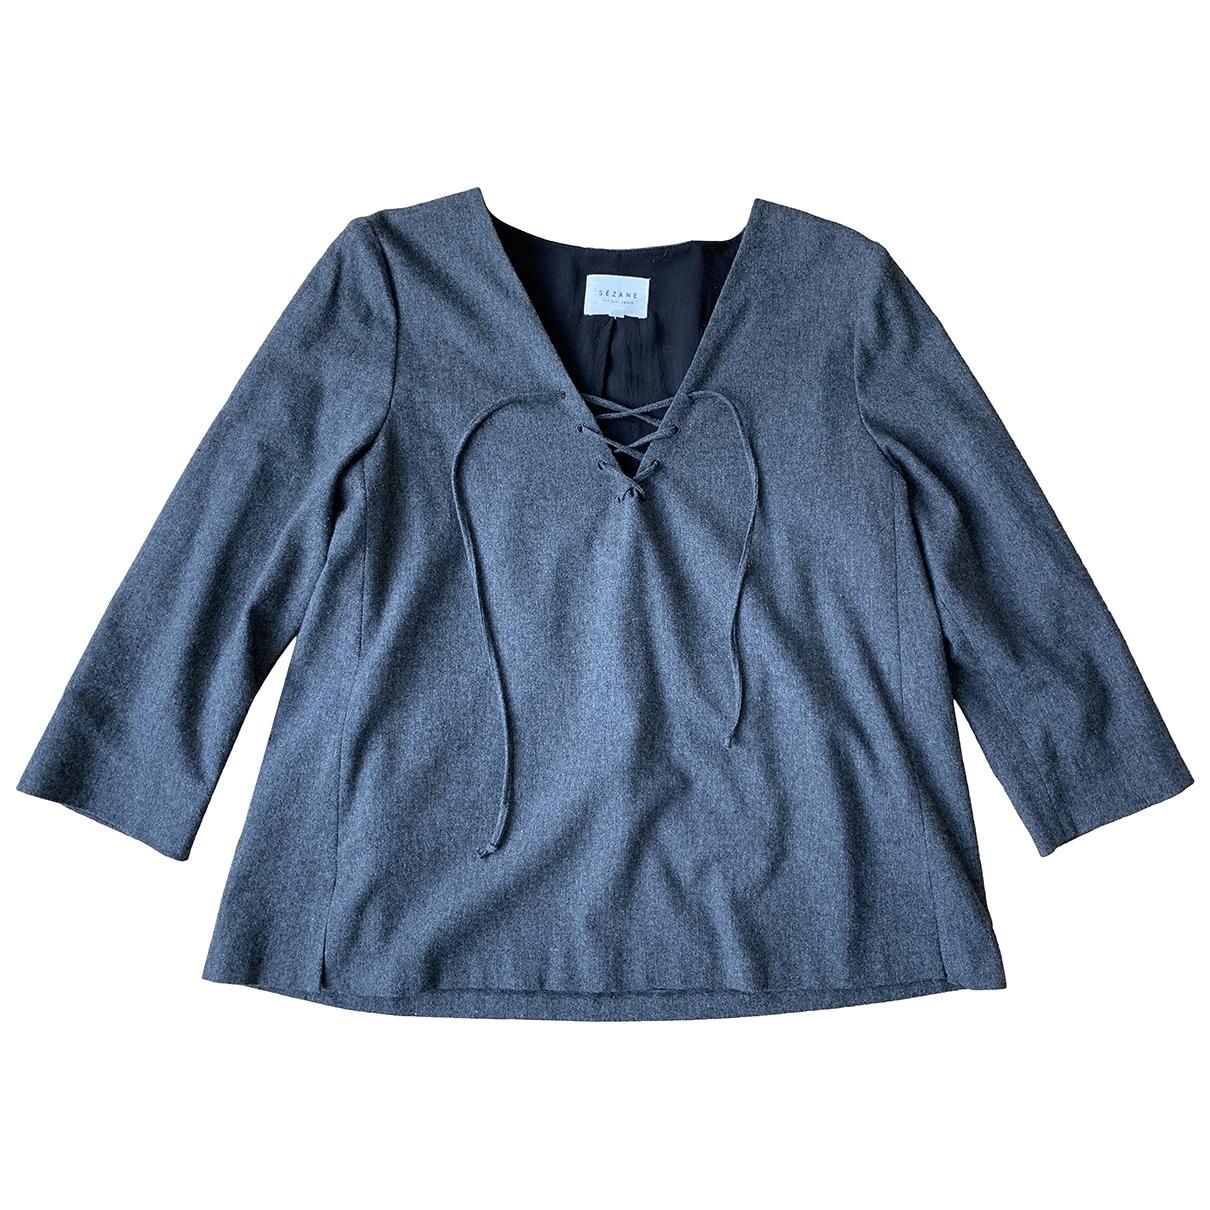 Sezane \N Top in  Grau Wolle